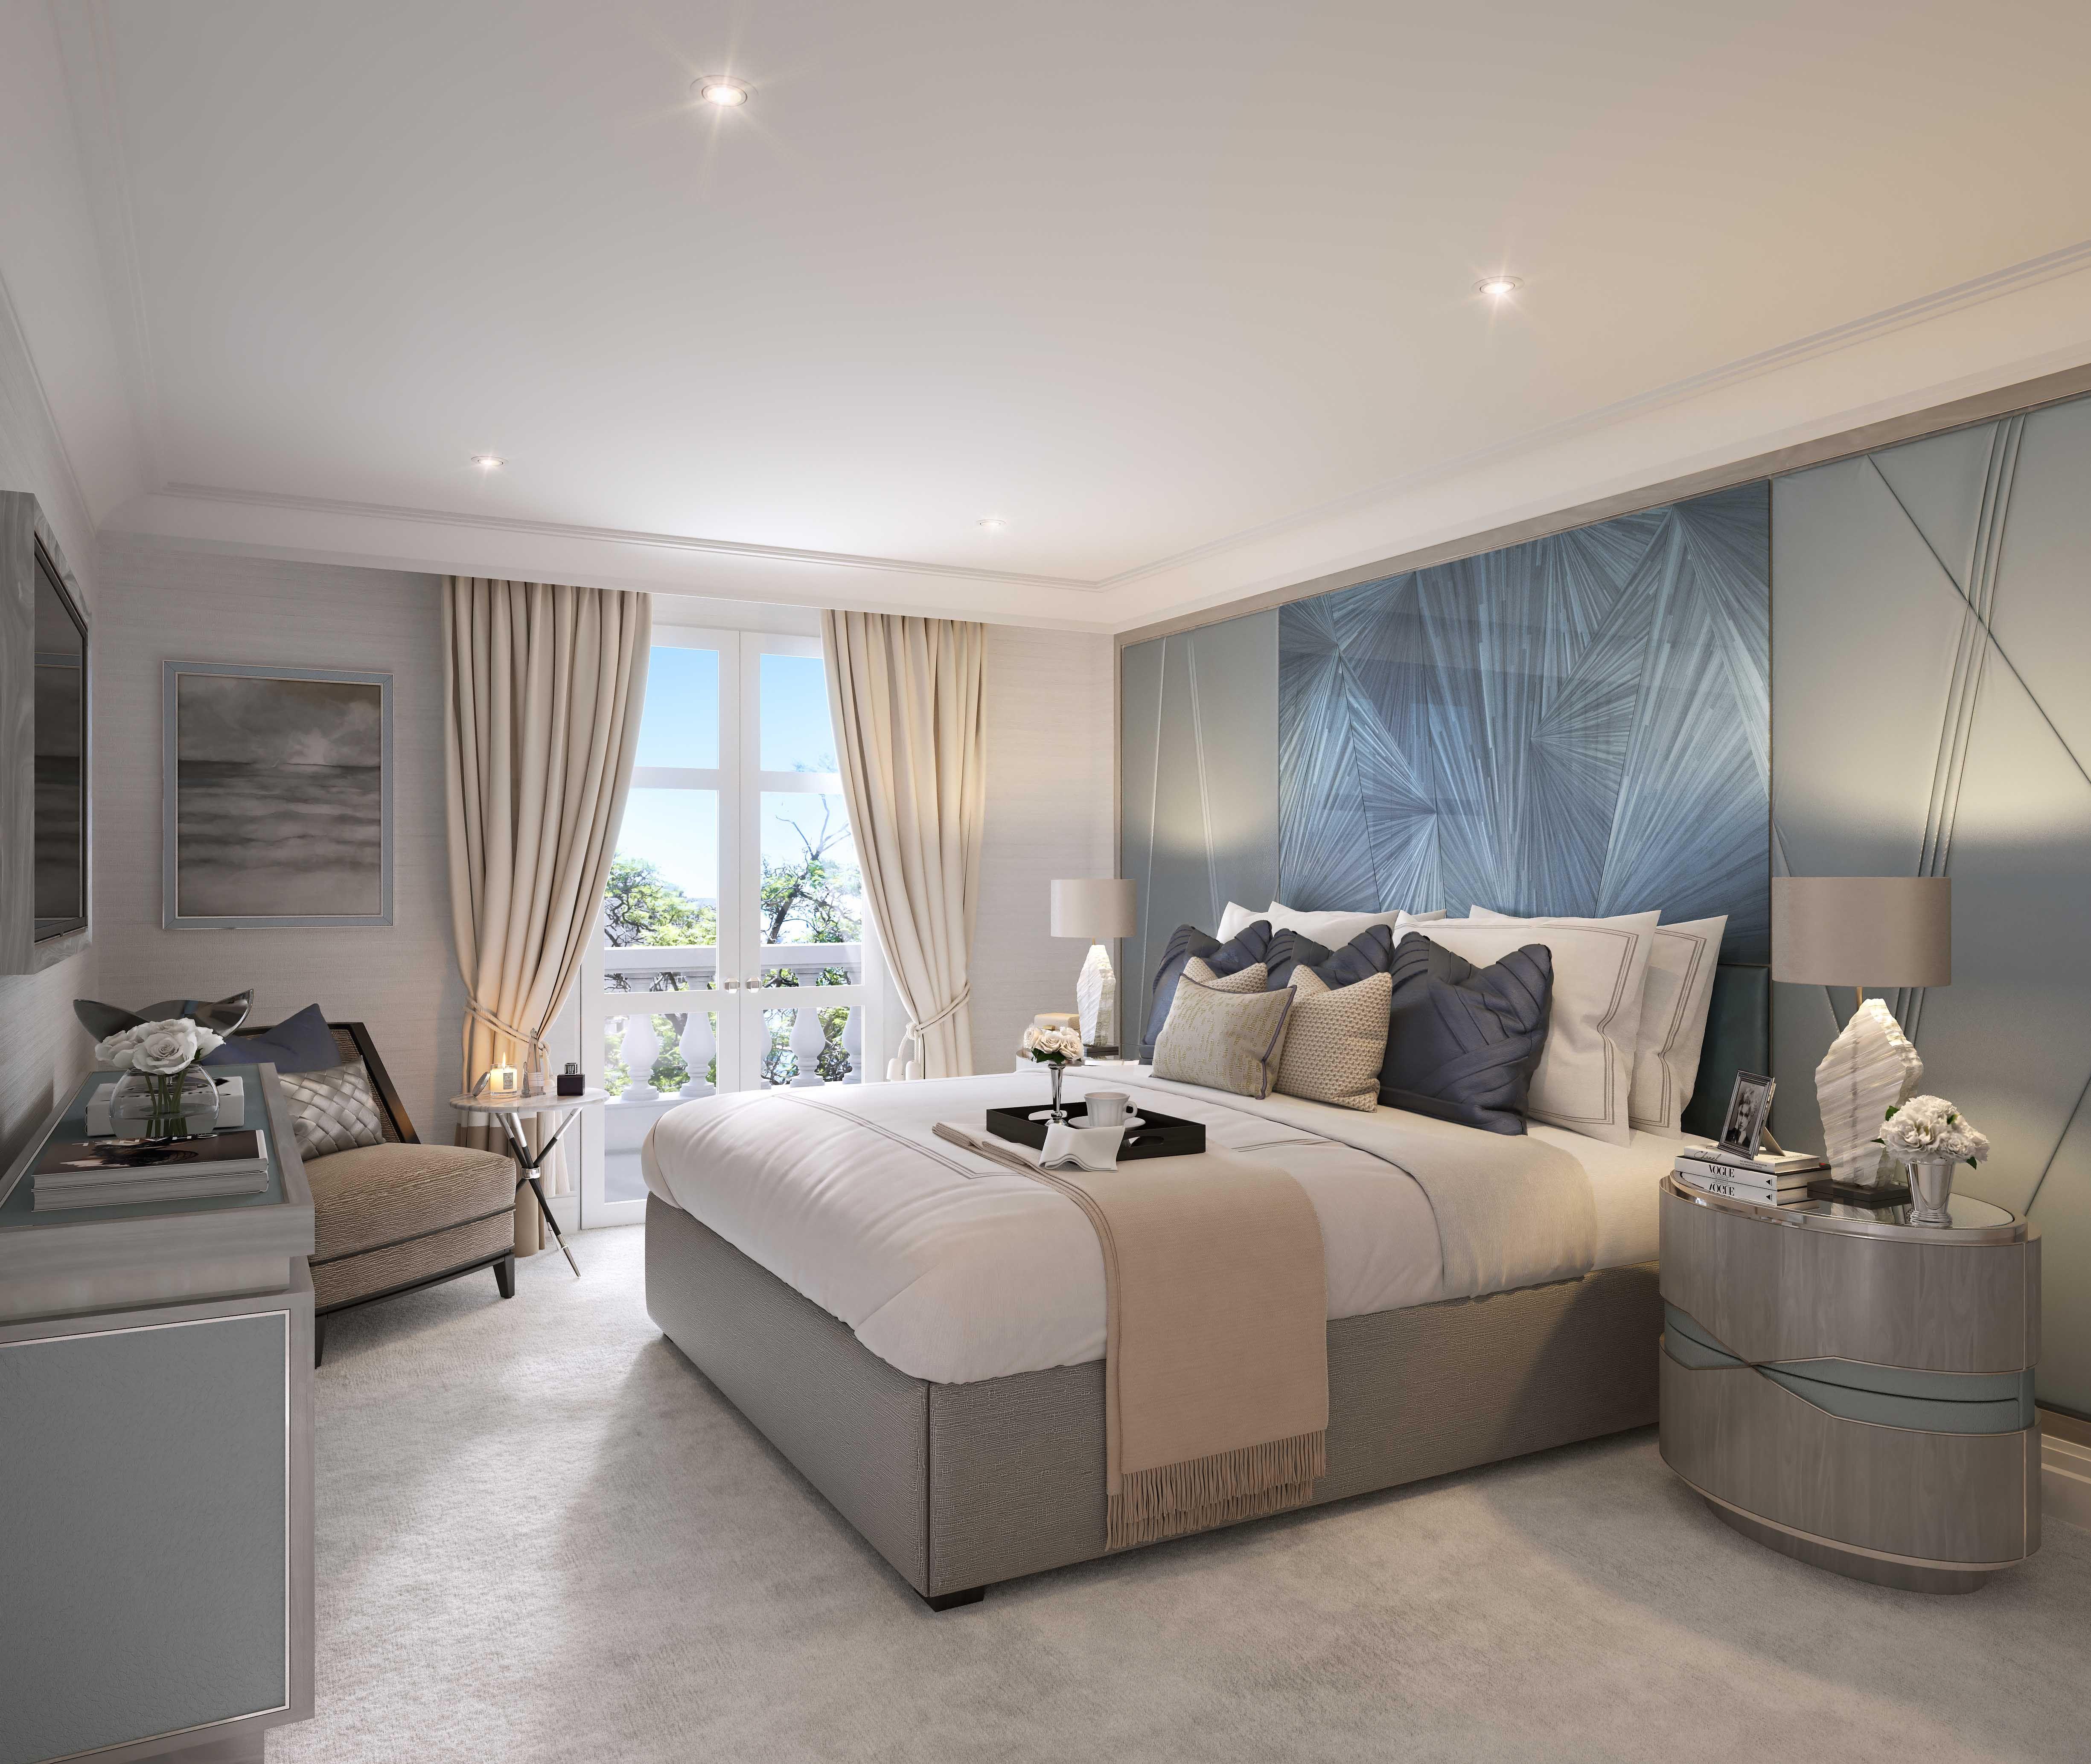 40 Guest Bedroom Ideas: Guest Bedroom, Villa La Vague - Morpheus London